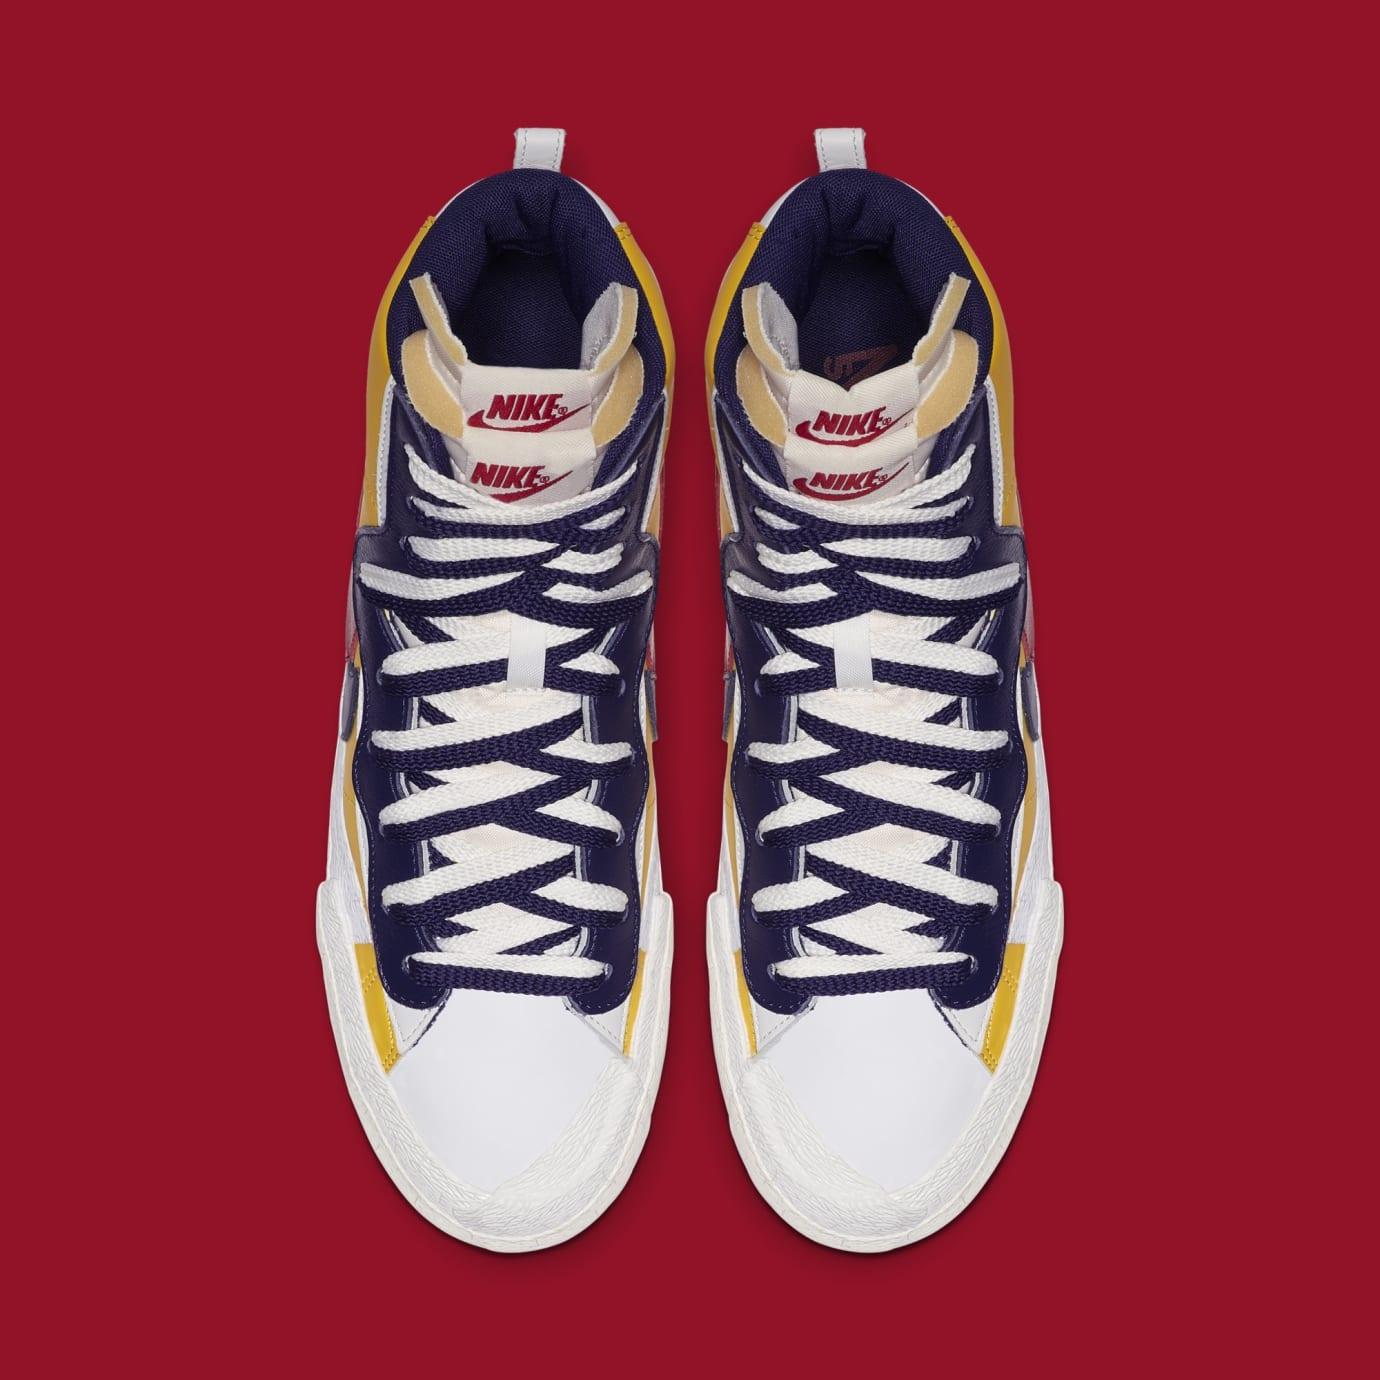 buying cheap shop premium selection Sacai x Nike Blazer High BV0072-001 BV0072-700 Collection ...